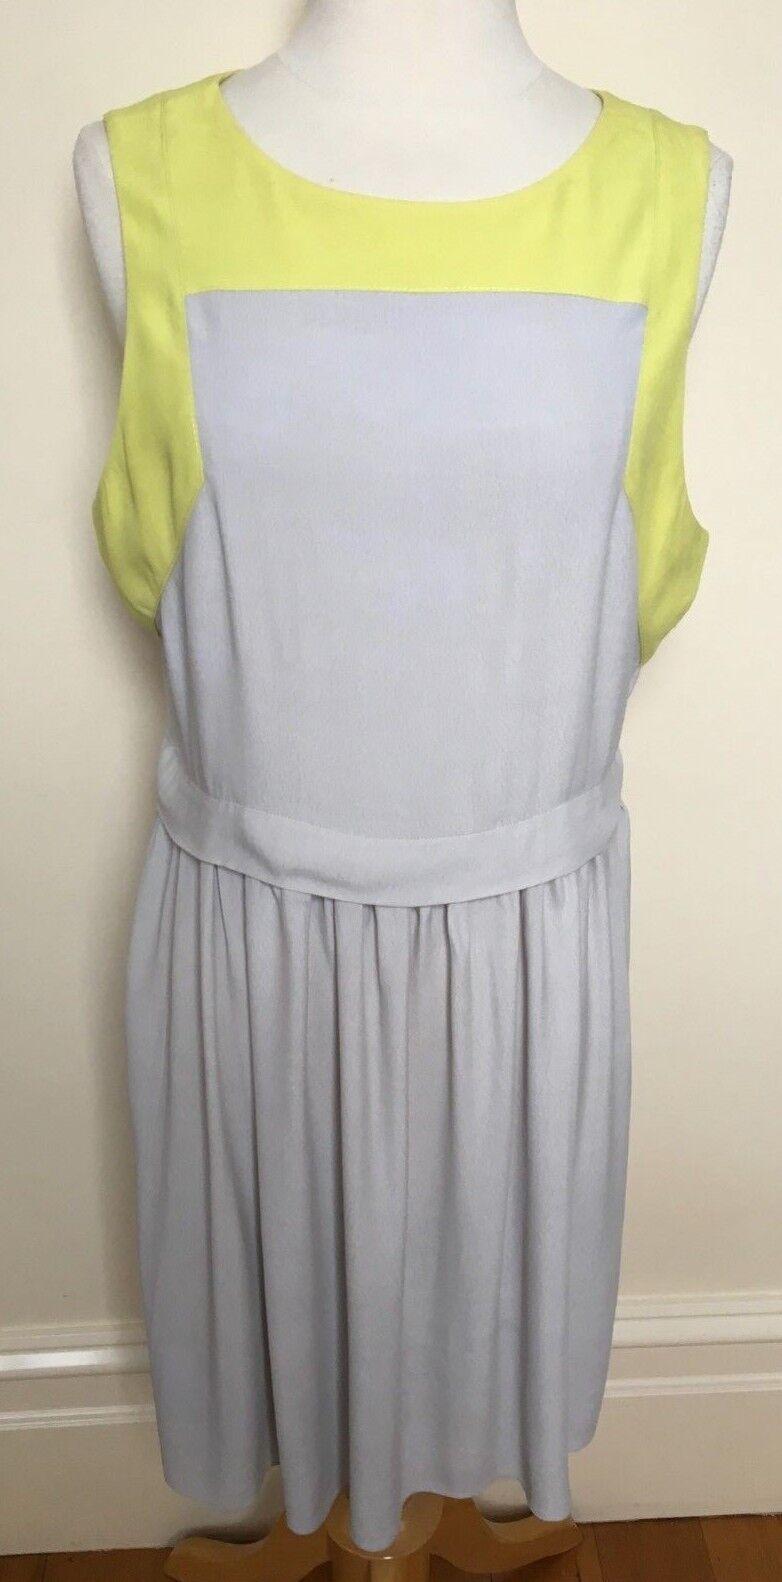 RODEO SHOW grau Citrus Lime Sleeveless Soft Drape Top Skirt Look Shift Dress 14